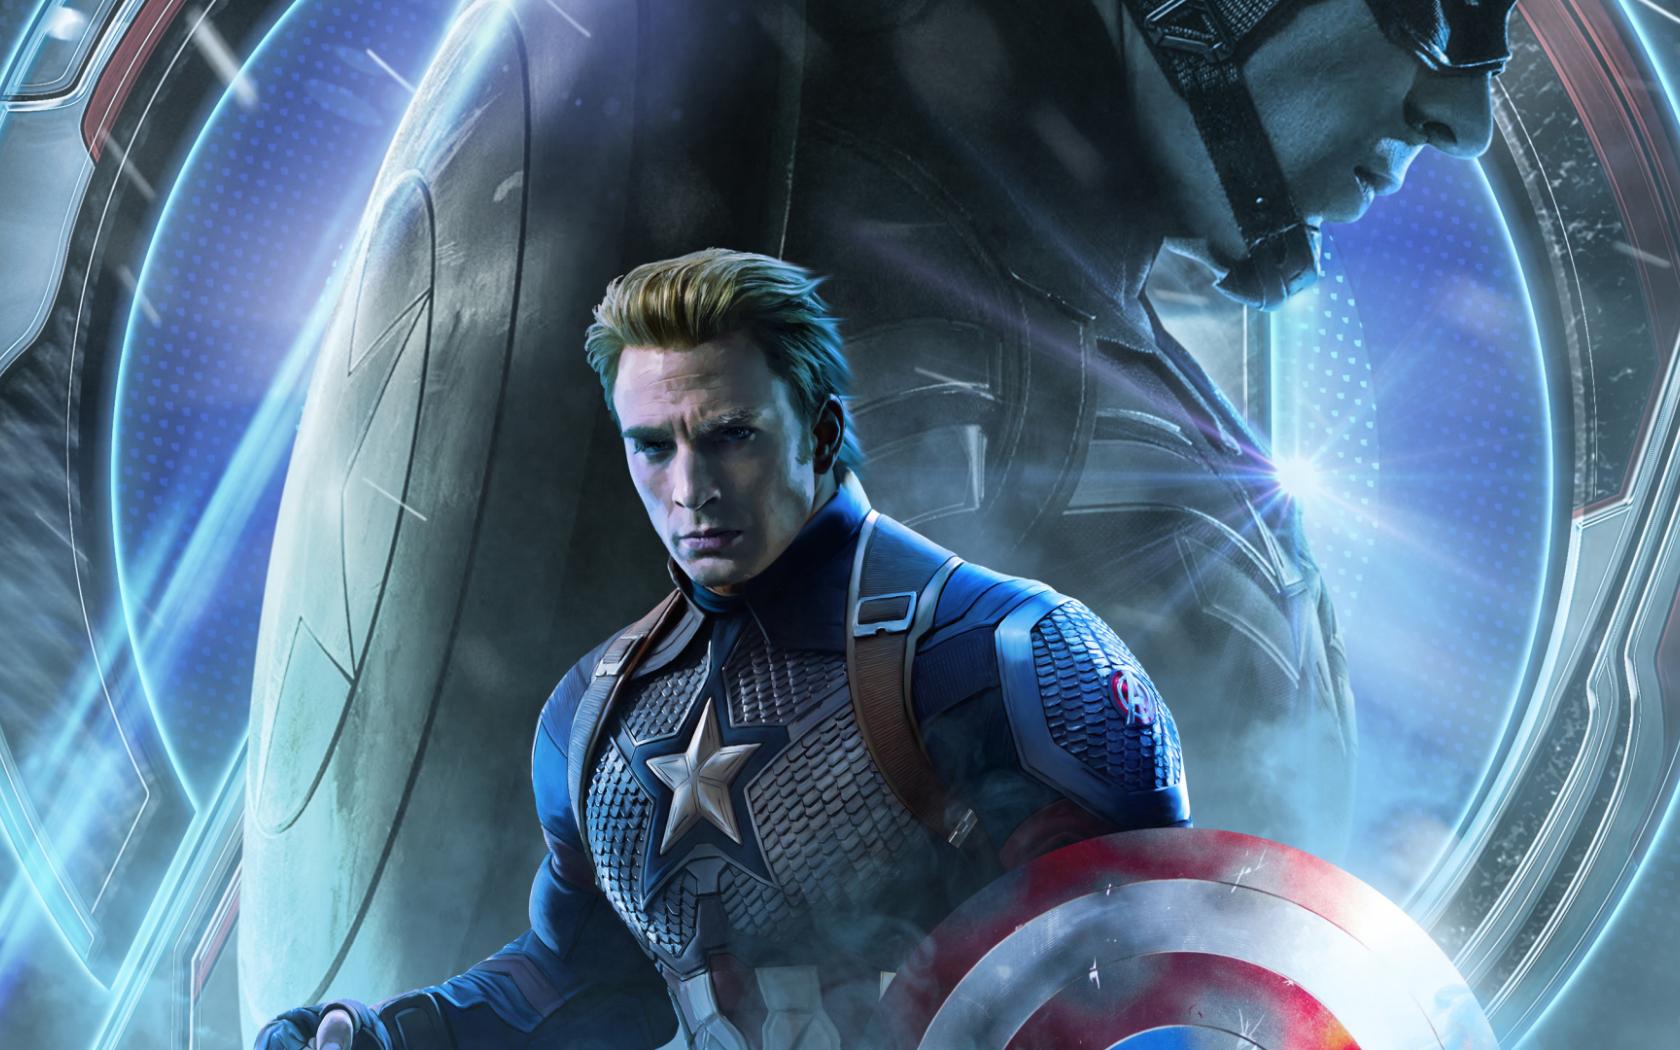 Free Download 1920x1080 Avengers Endgame Captain America